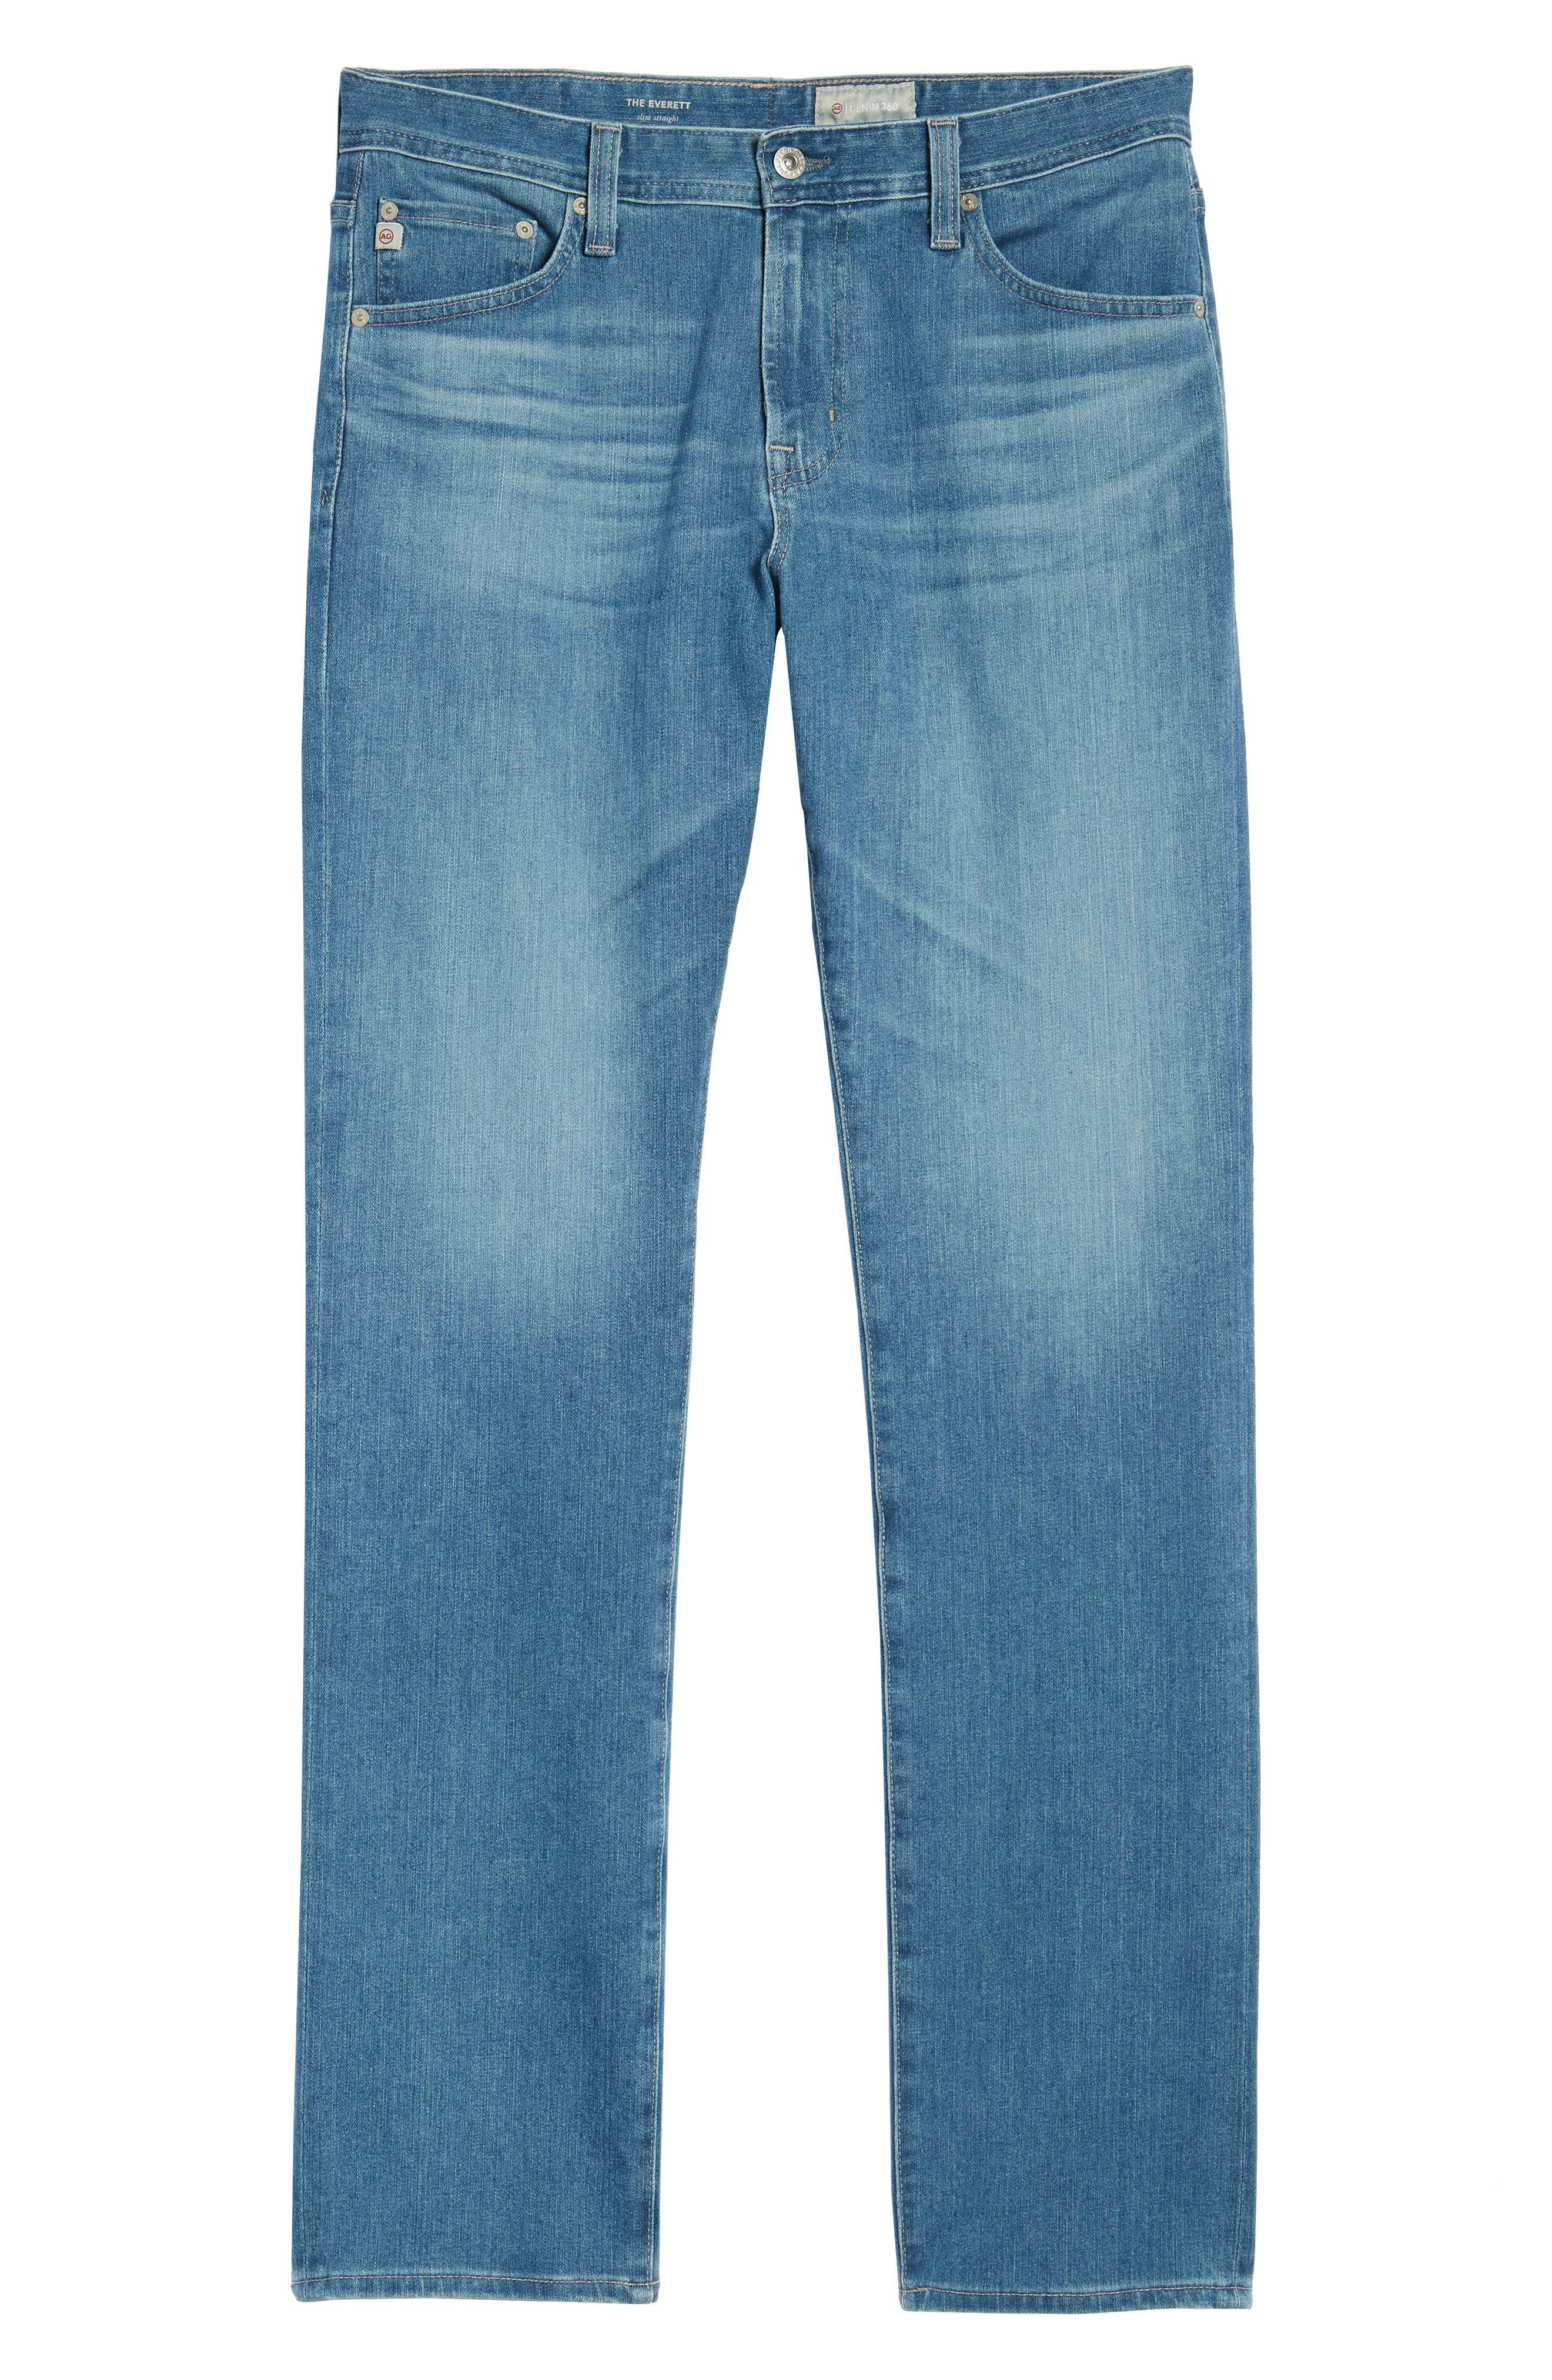 Everett Slim Straight Leg Jeans,                             Alternate thumbnail 6, color,                             SEA WAVE